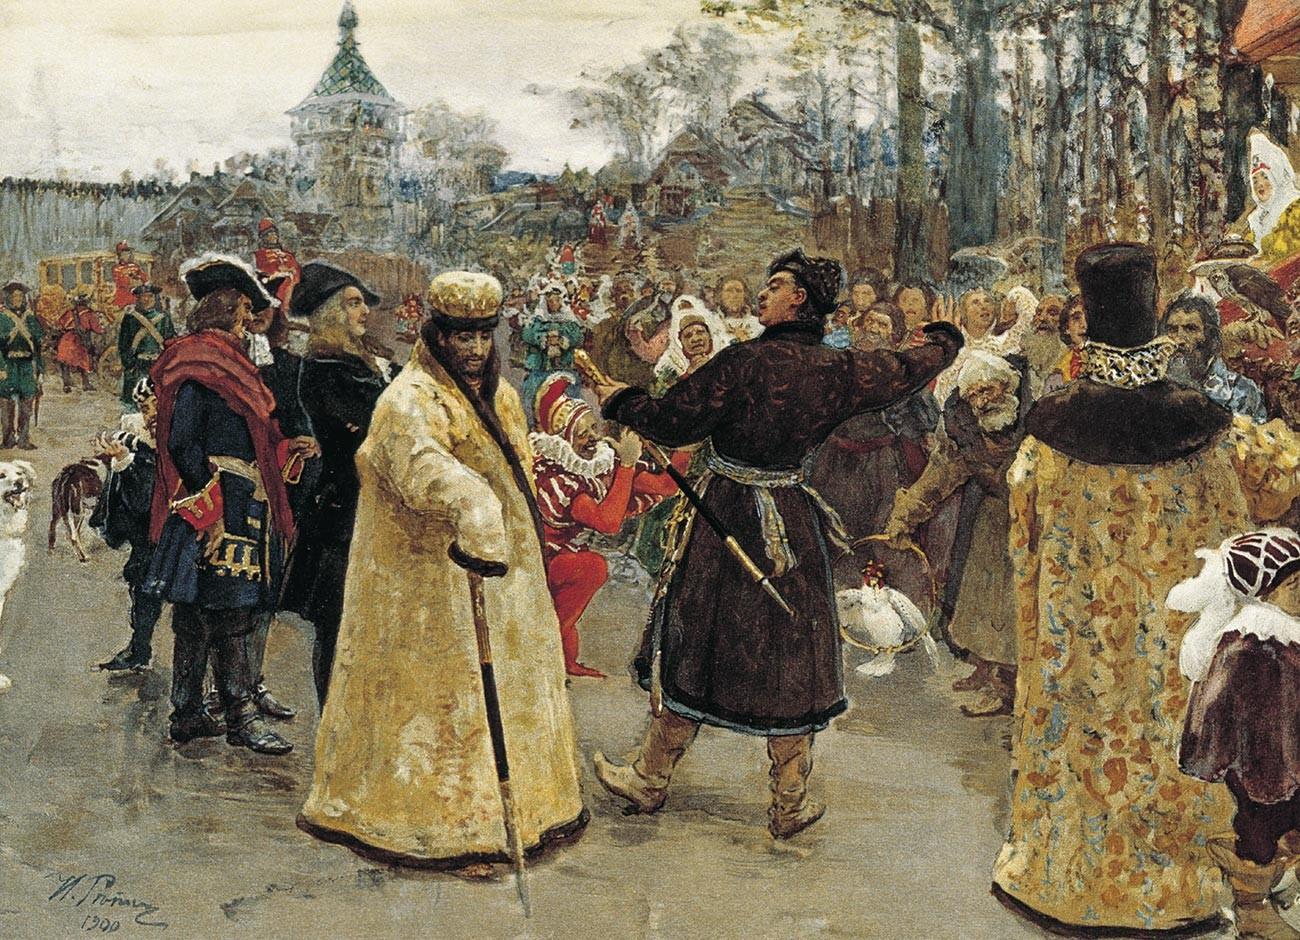 Ilya Repin. Arrival tsars Piotr and Ioann, 1900